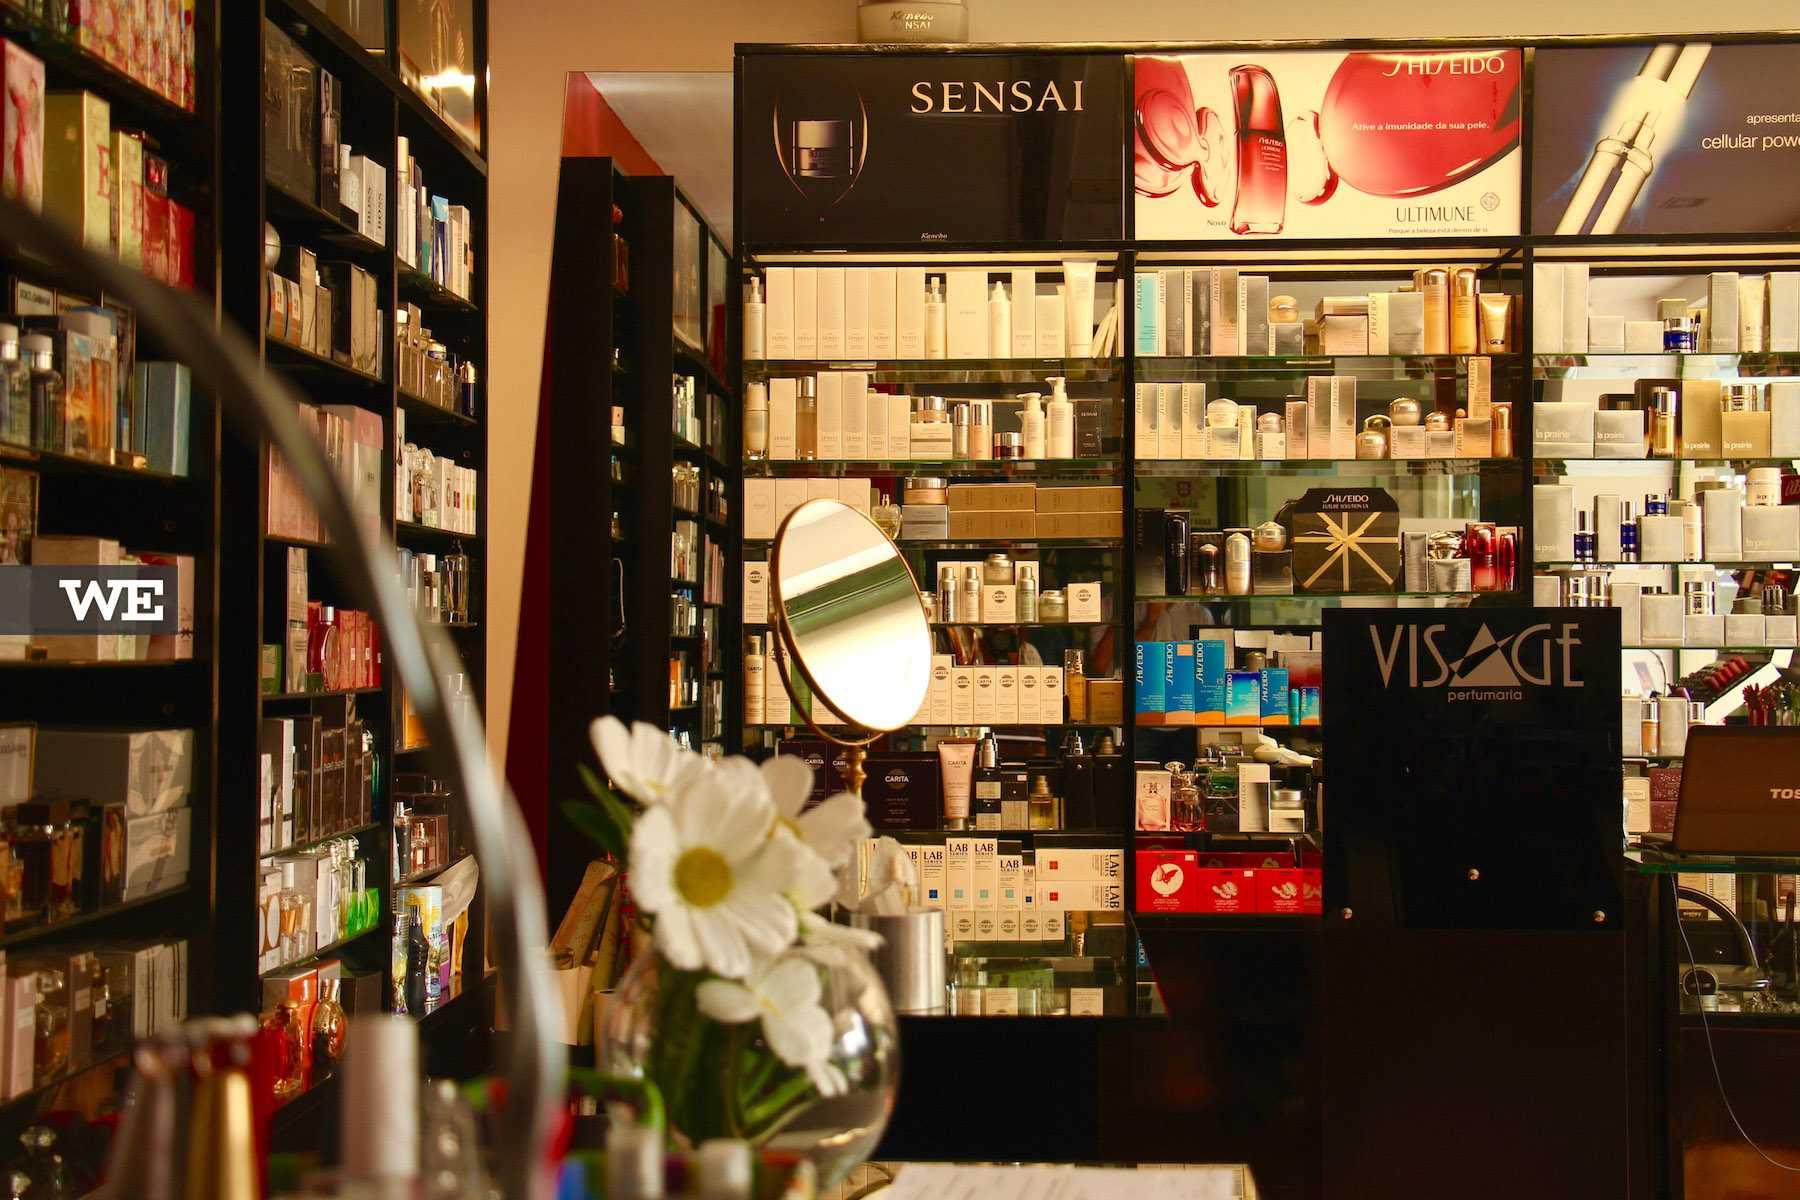 Interior da loja - Visage Perfumaria